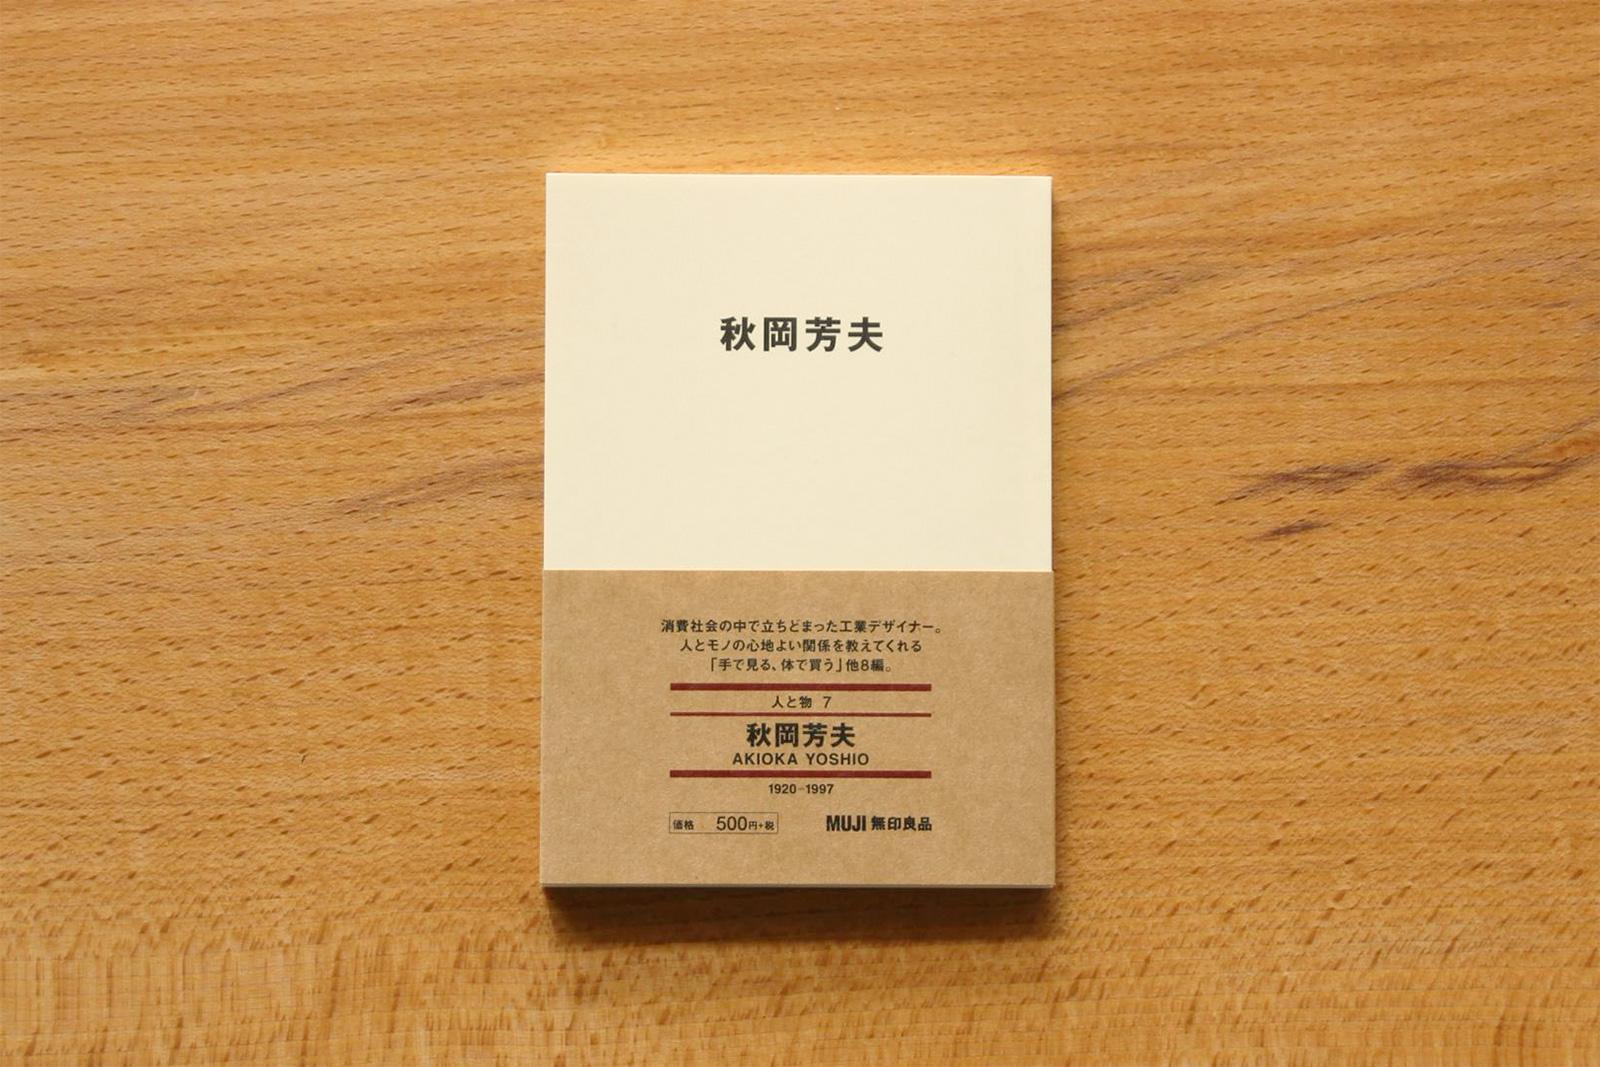 MUJI BOOKS 『秋岡芳夫』